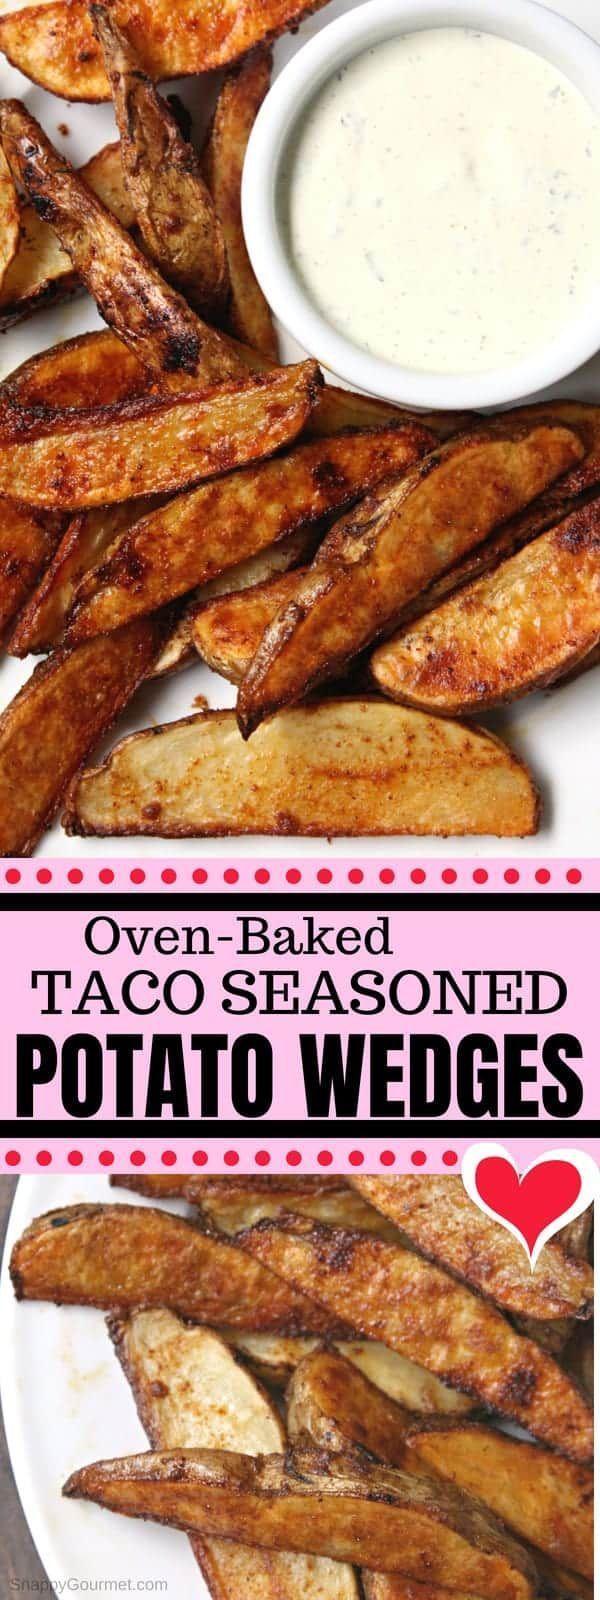 Oven Baked Potato Wedges, taco seasoned potato wedges baked in the oven until cr...   - Goat - #Baked #Goat #oven #Potato #Seasoned #taco #Wedges #kartoffeleckenbackofen